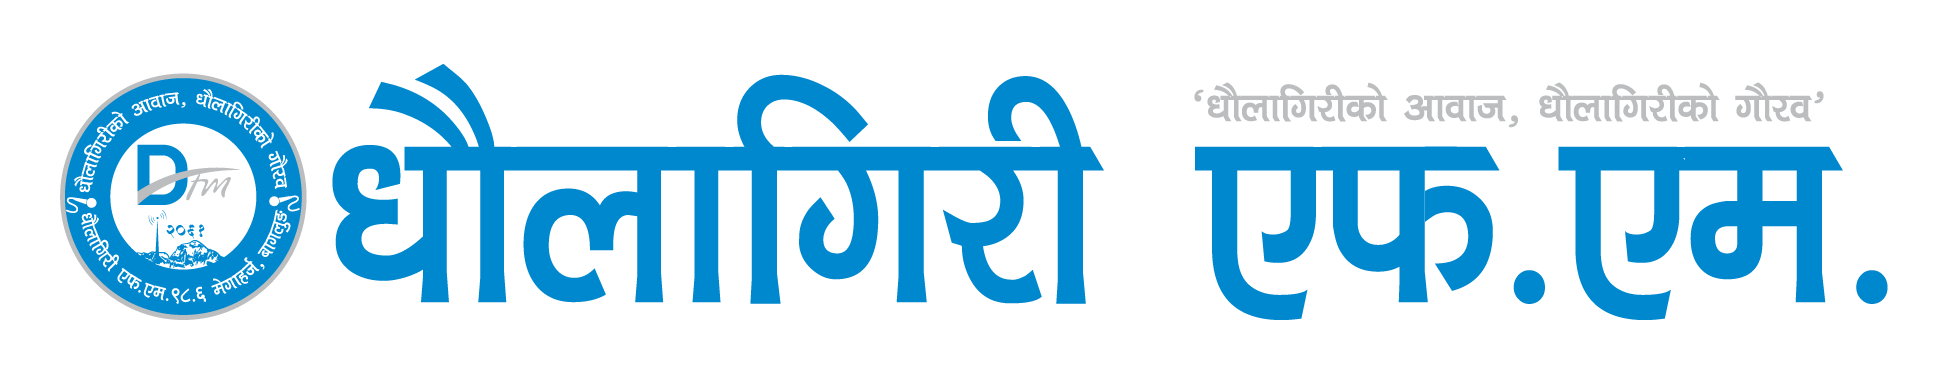 धौलागिरी एफ.एम.